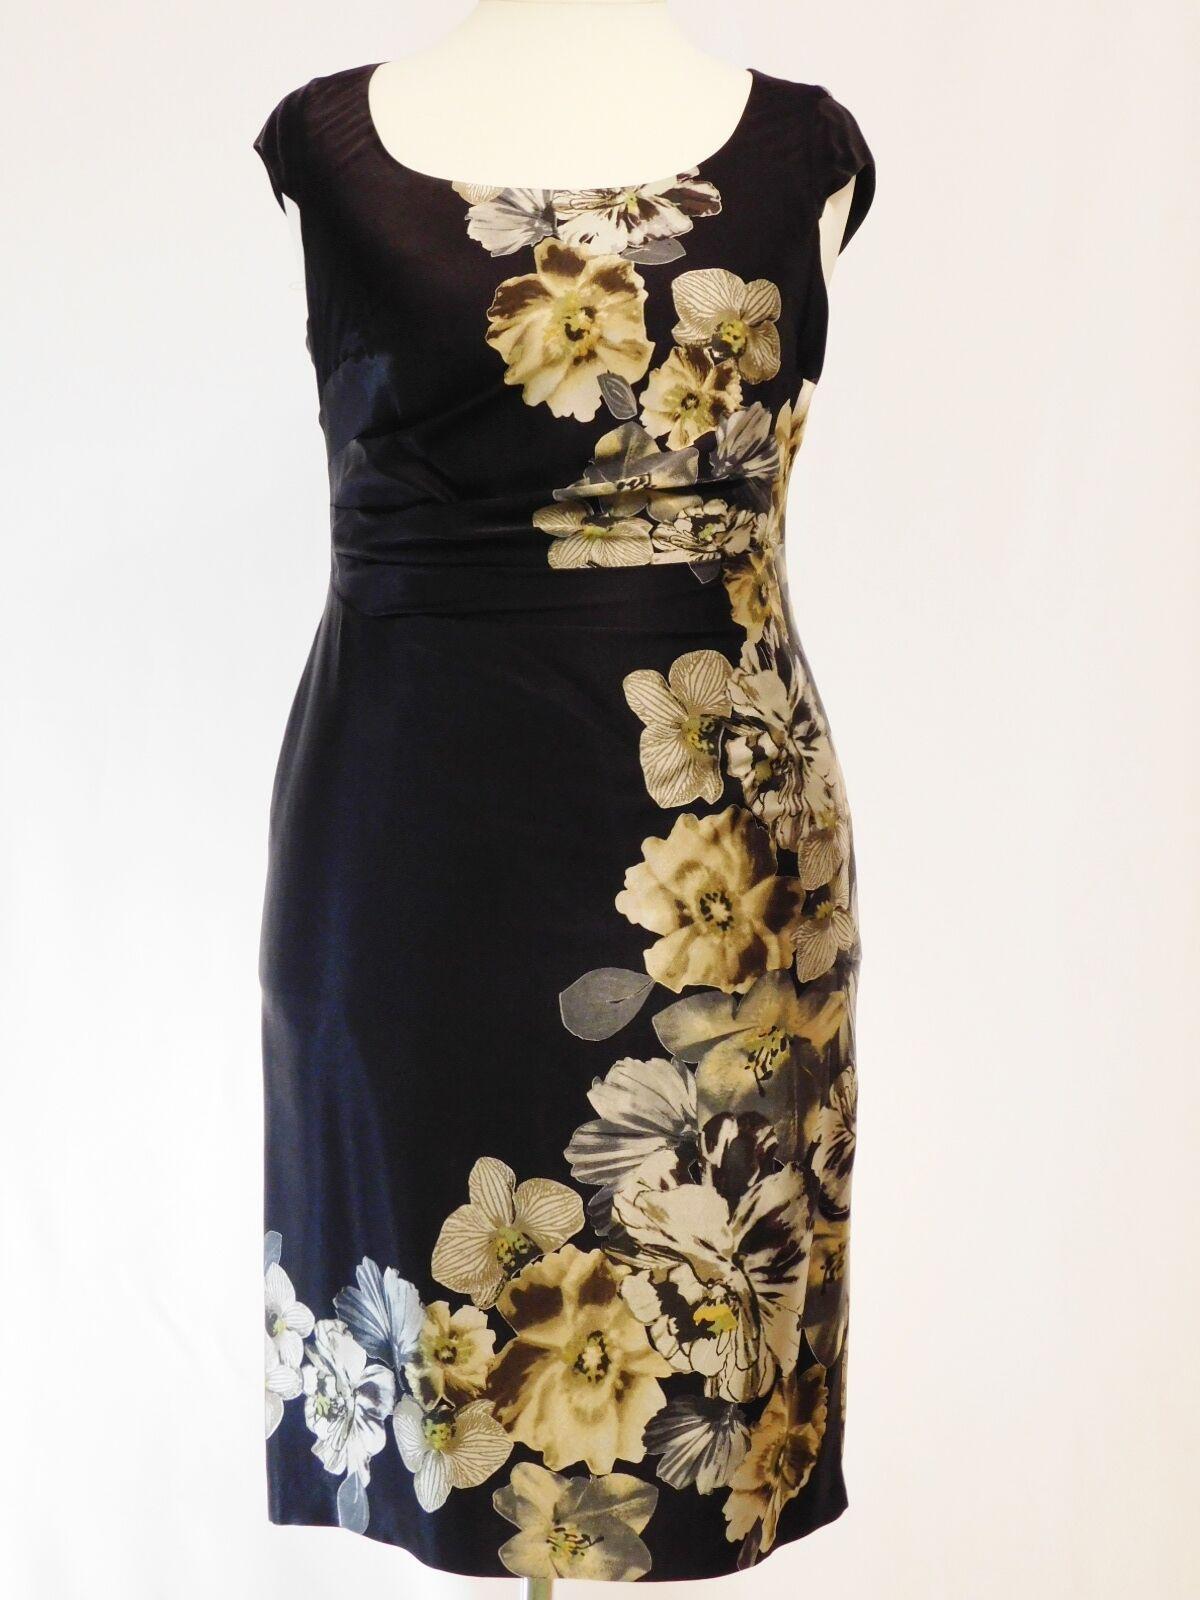 10 Einzigartig Kleid 44 Elegant Spezialgebiet15 Perfekt Kleid 44 Elegant Vertrieb